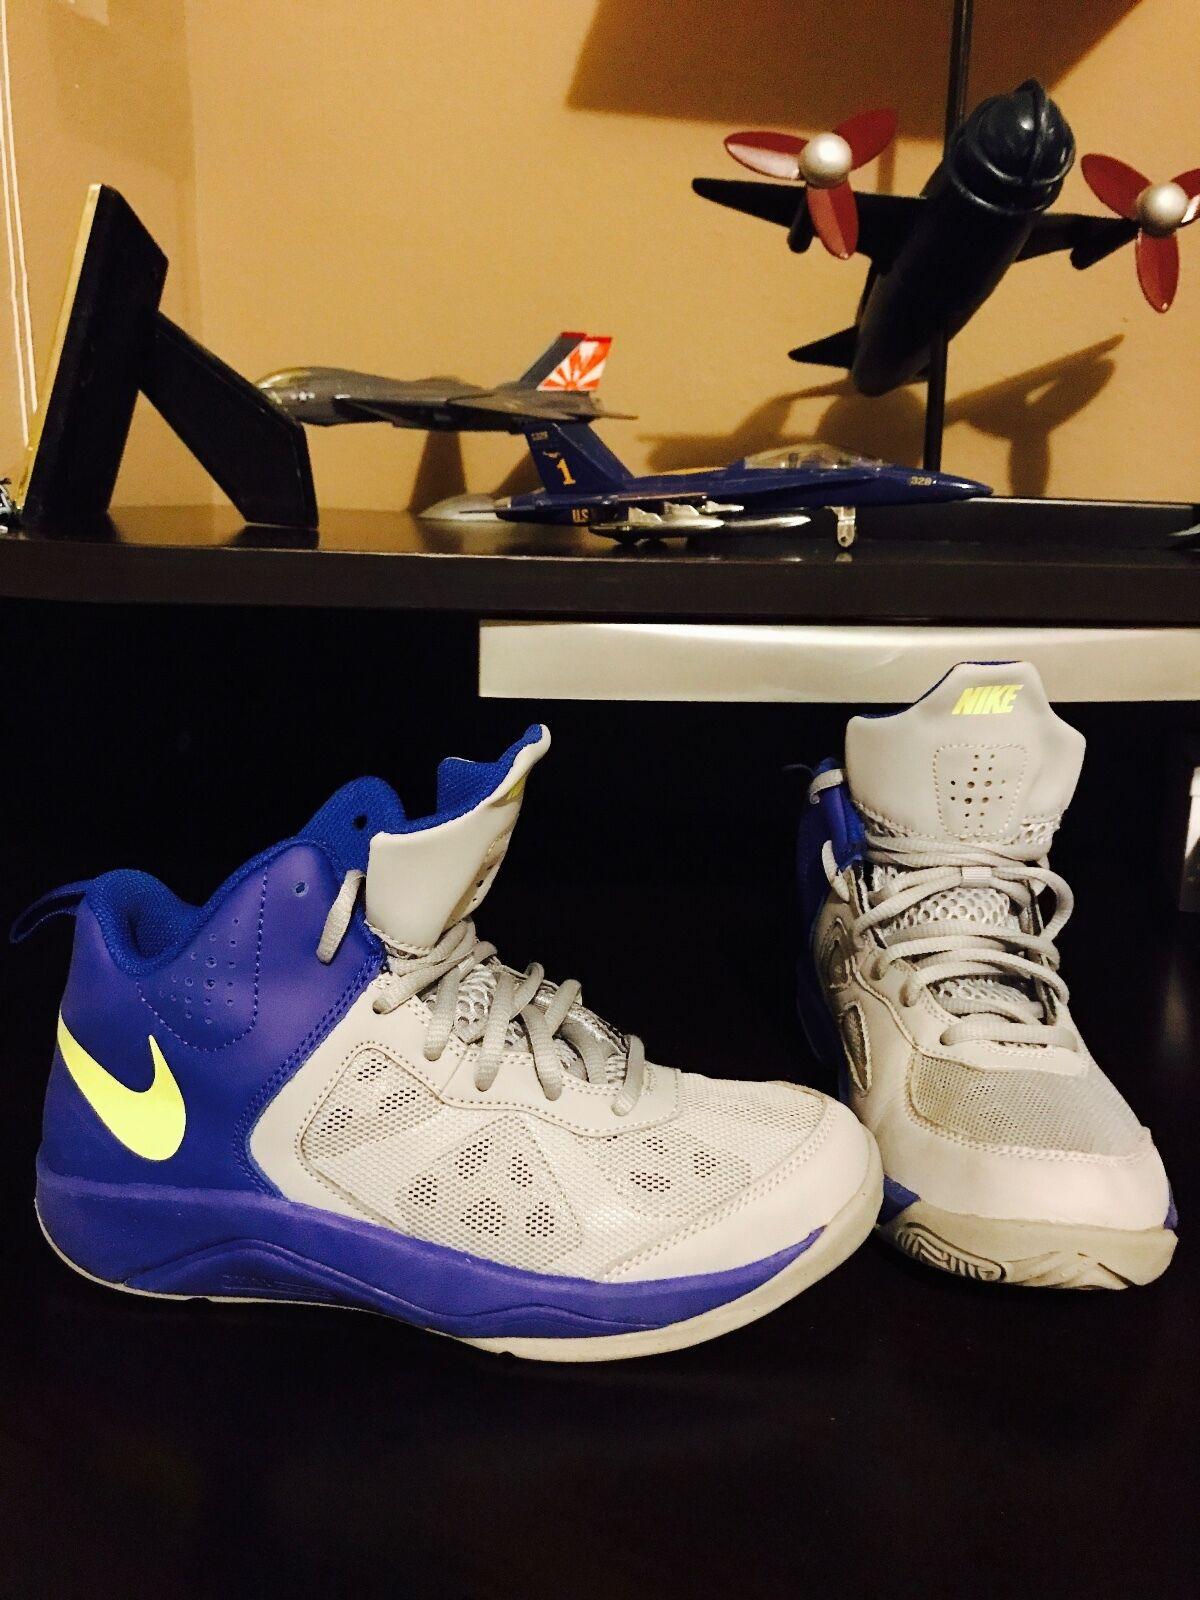 Nike schuhe größe 4,5 y in perfektem zustand